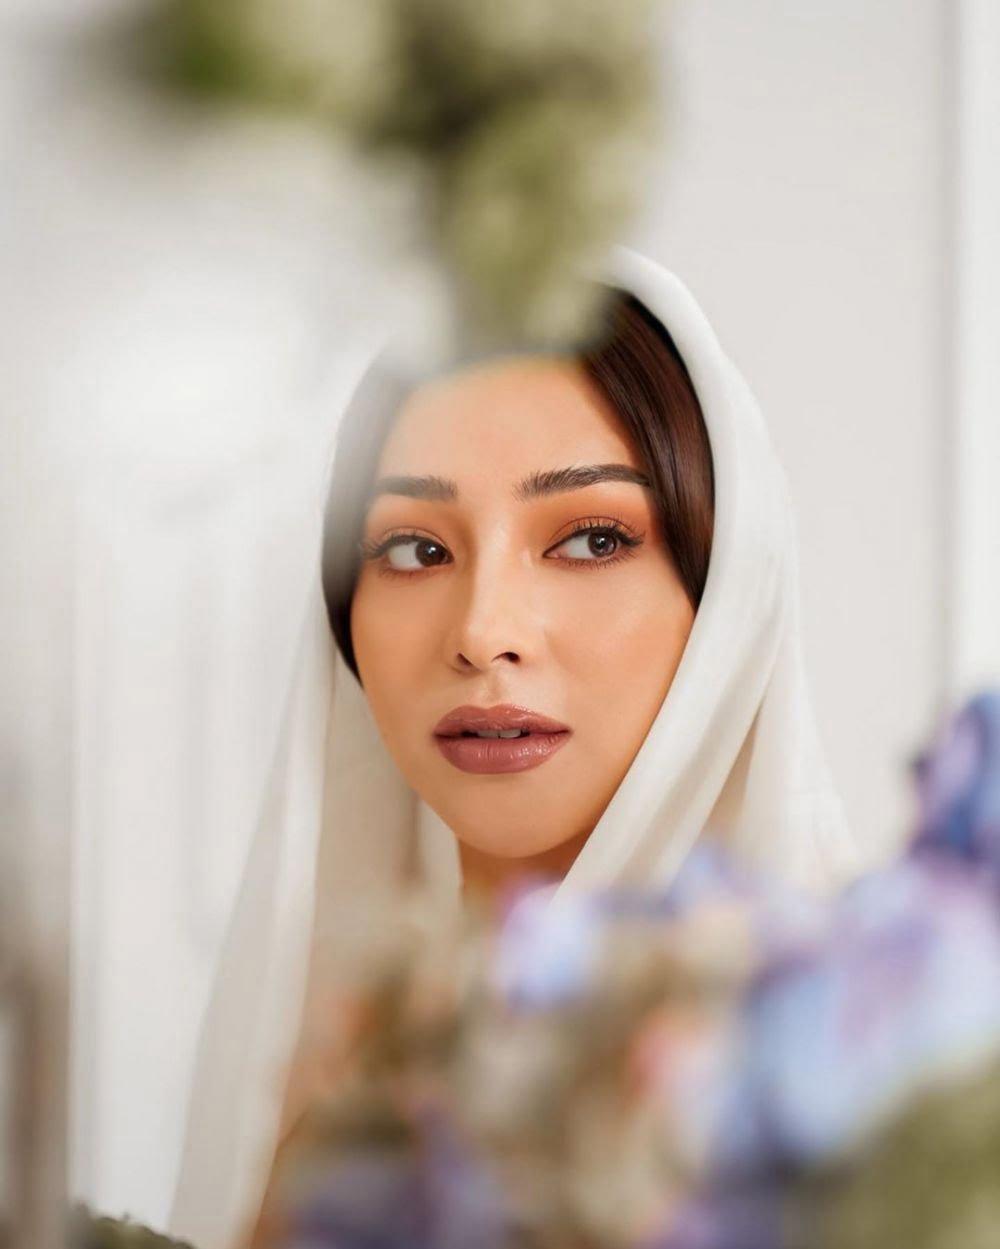 Pelan-Pelan Berhijrah, 10 potret Nikita Willy Kenakan Hijab Bikin Hati Adem